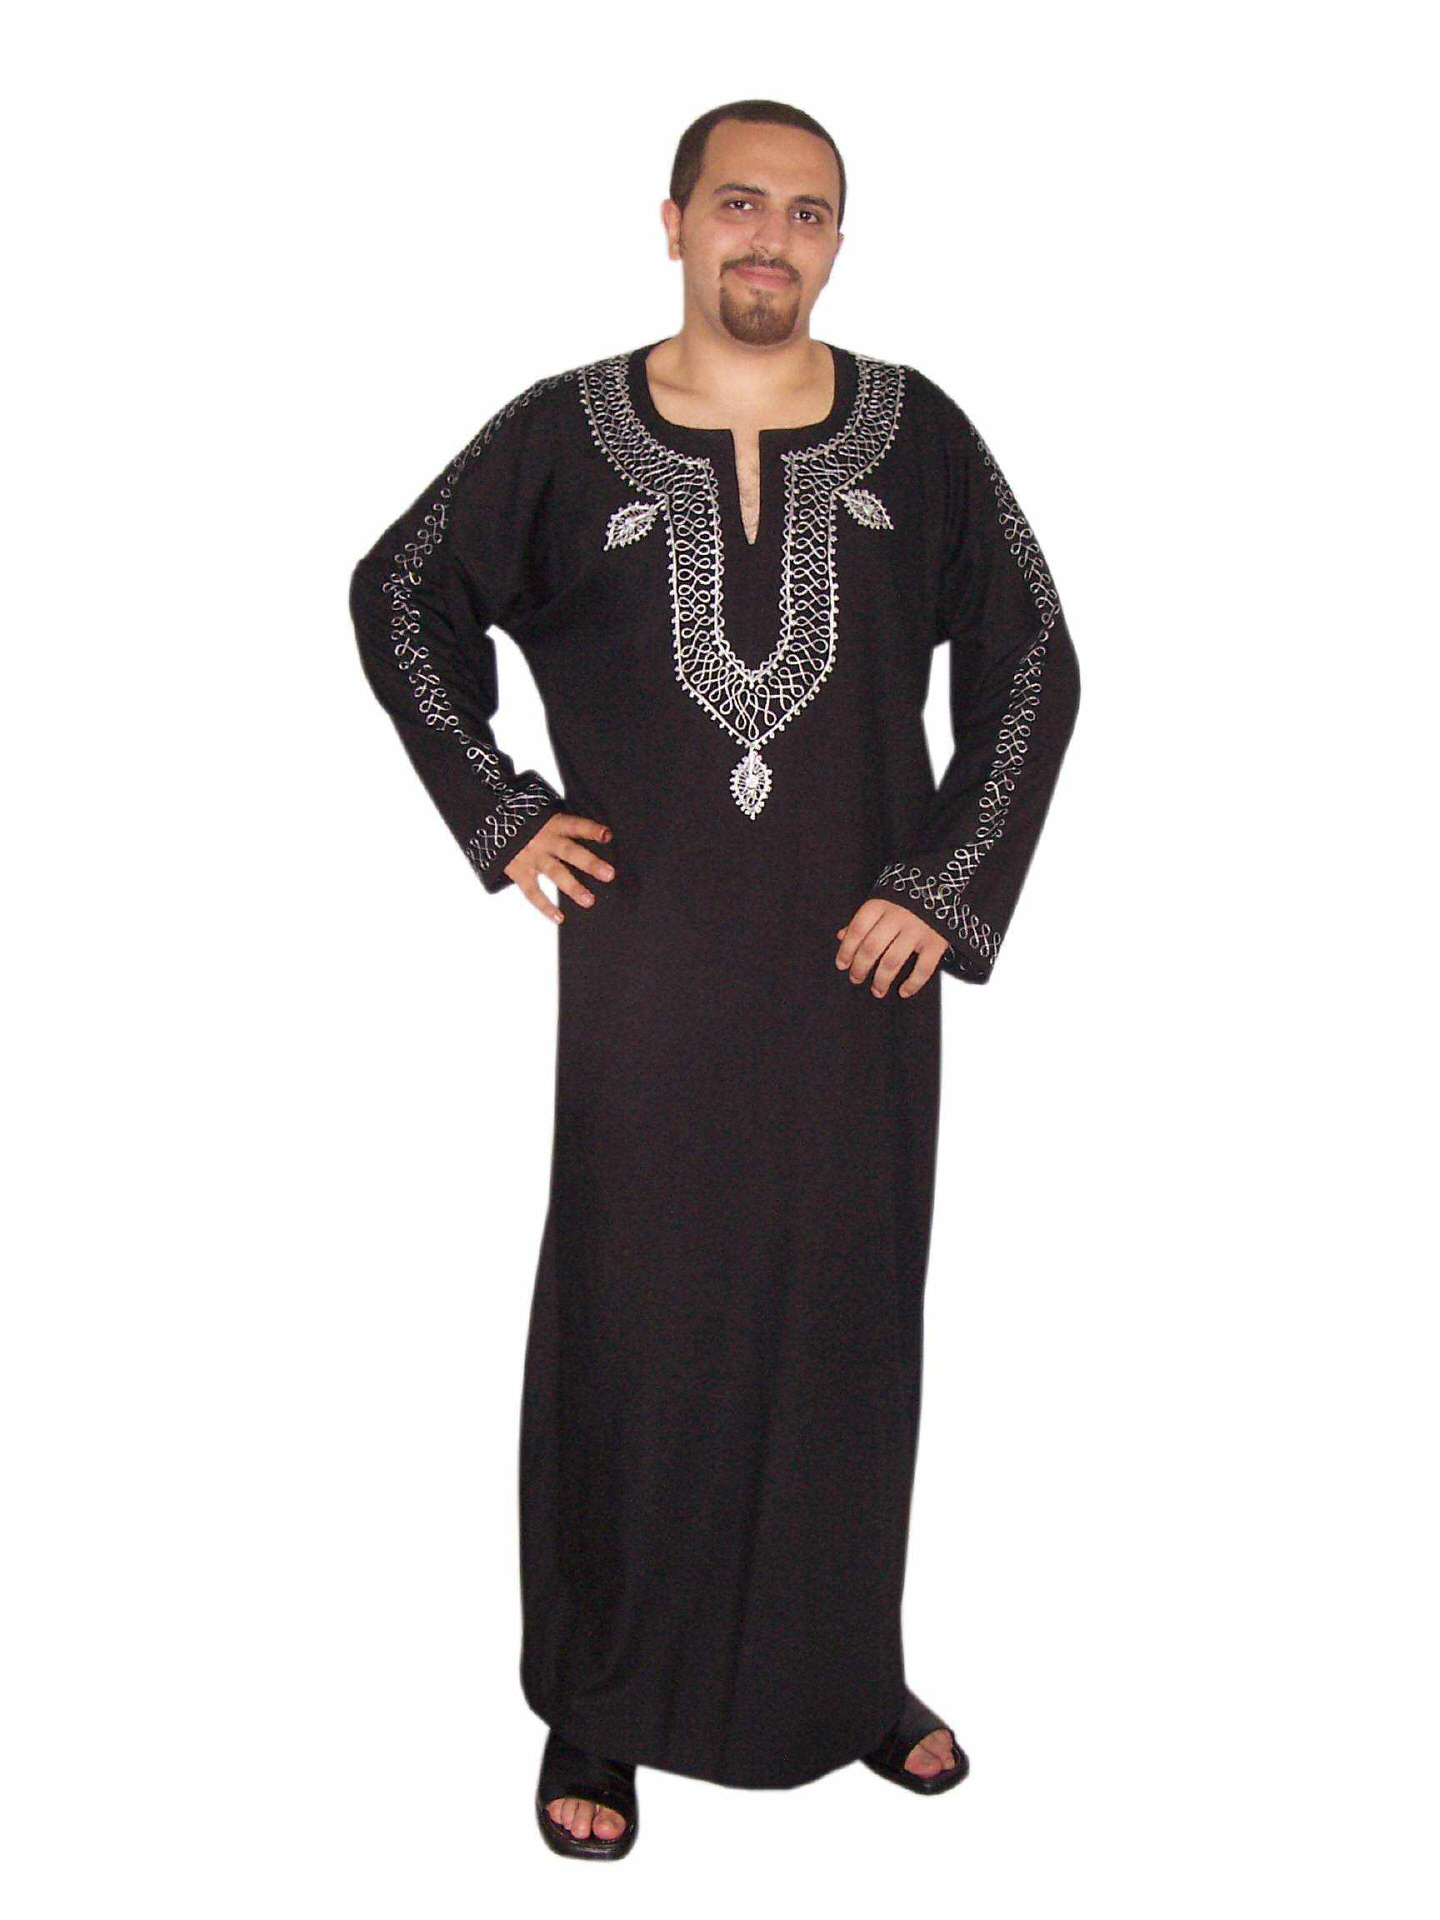 herren kaftan orientalische kleidung mittelalter gewandung. Black Bedroom Furniture Sets. Home Design Ideas